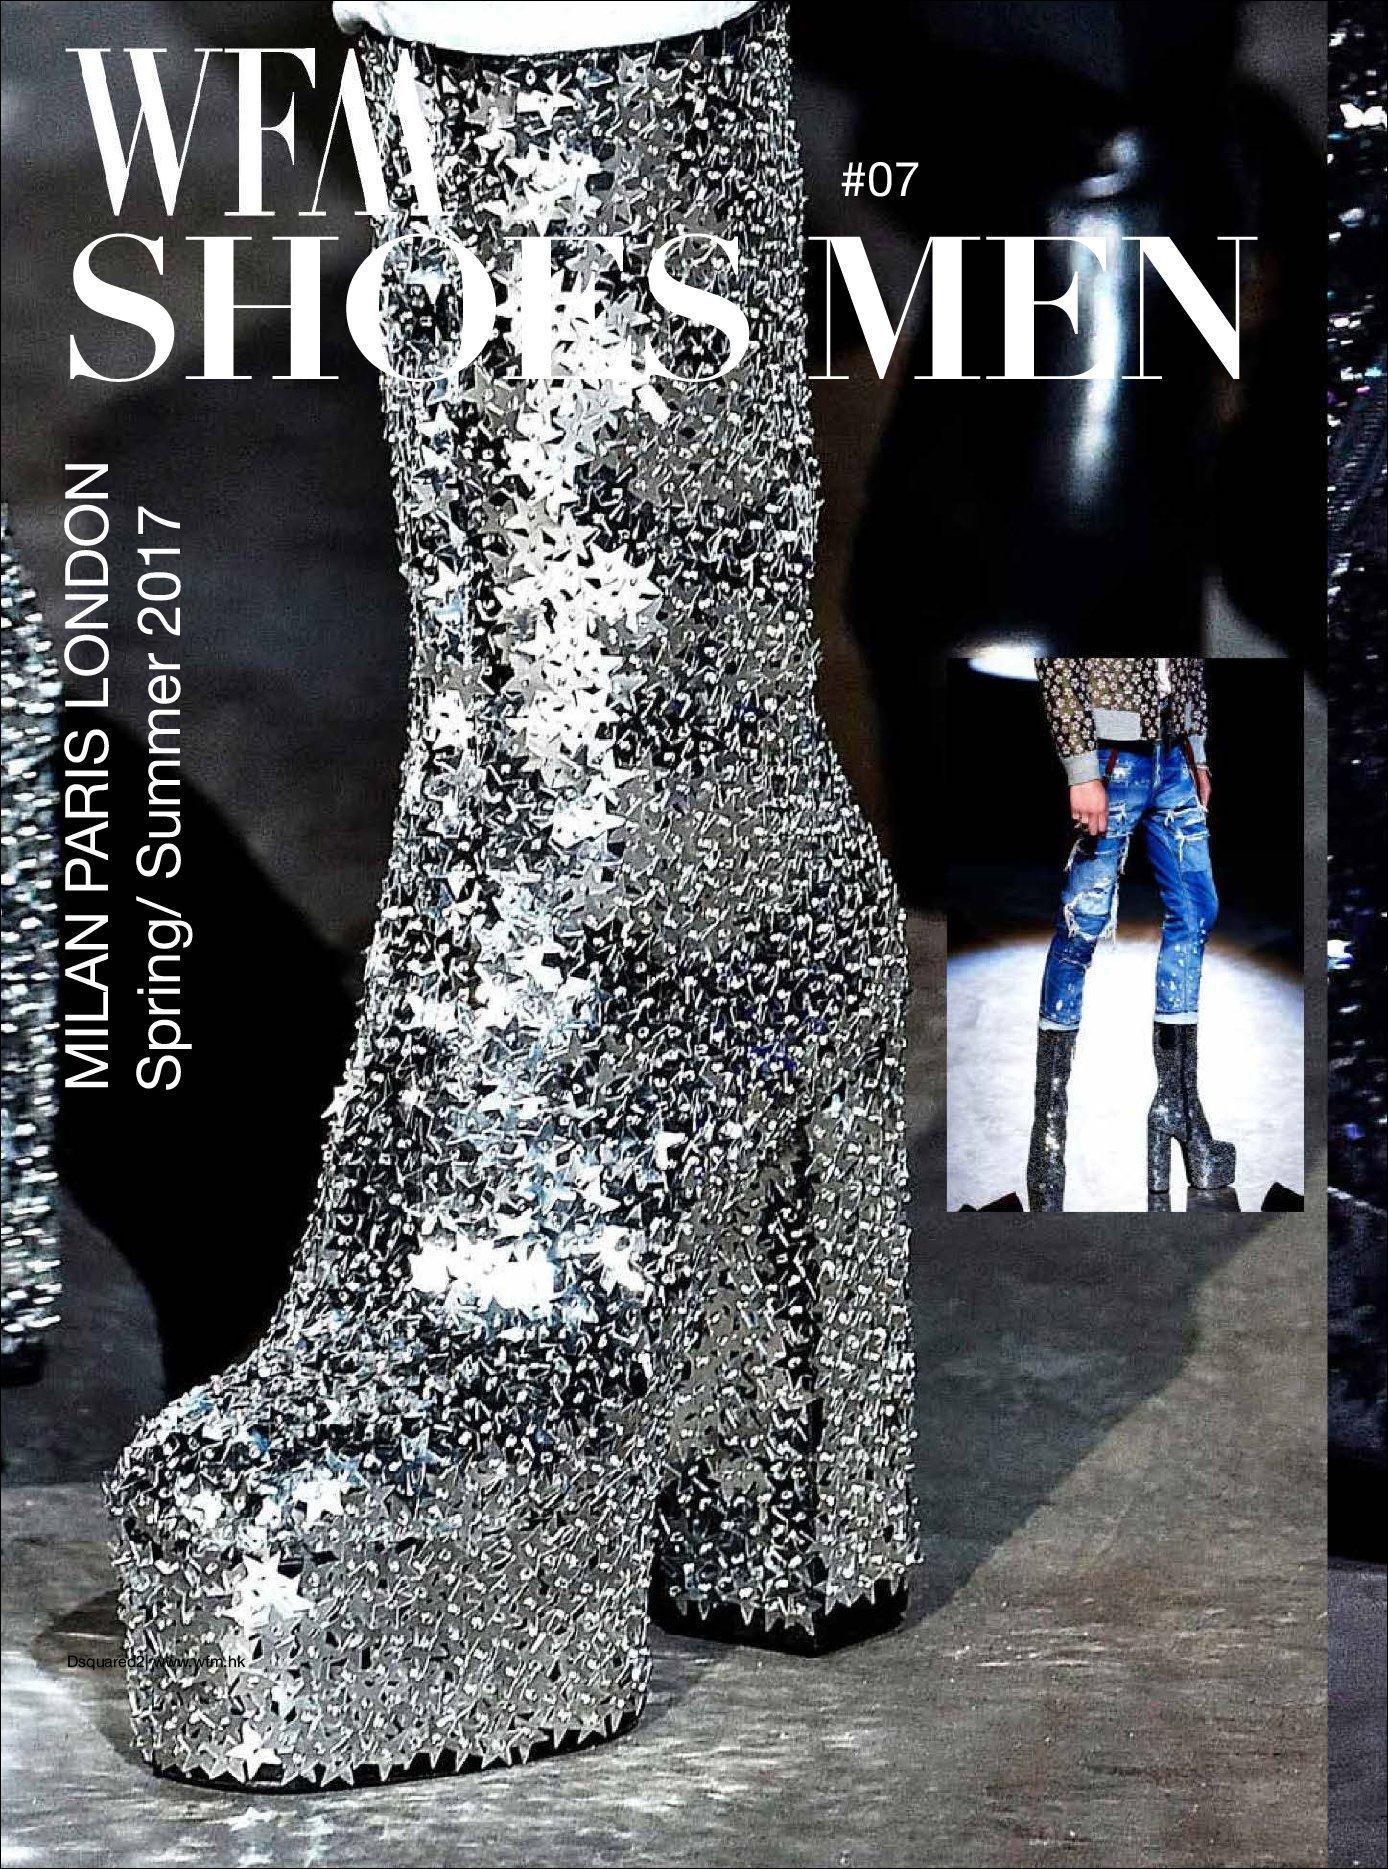 WFM SHOES MEN (Digital)